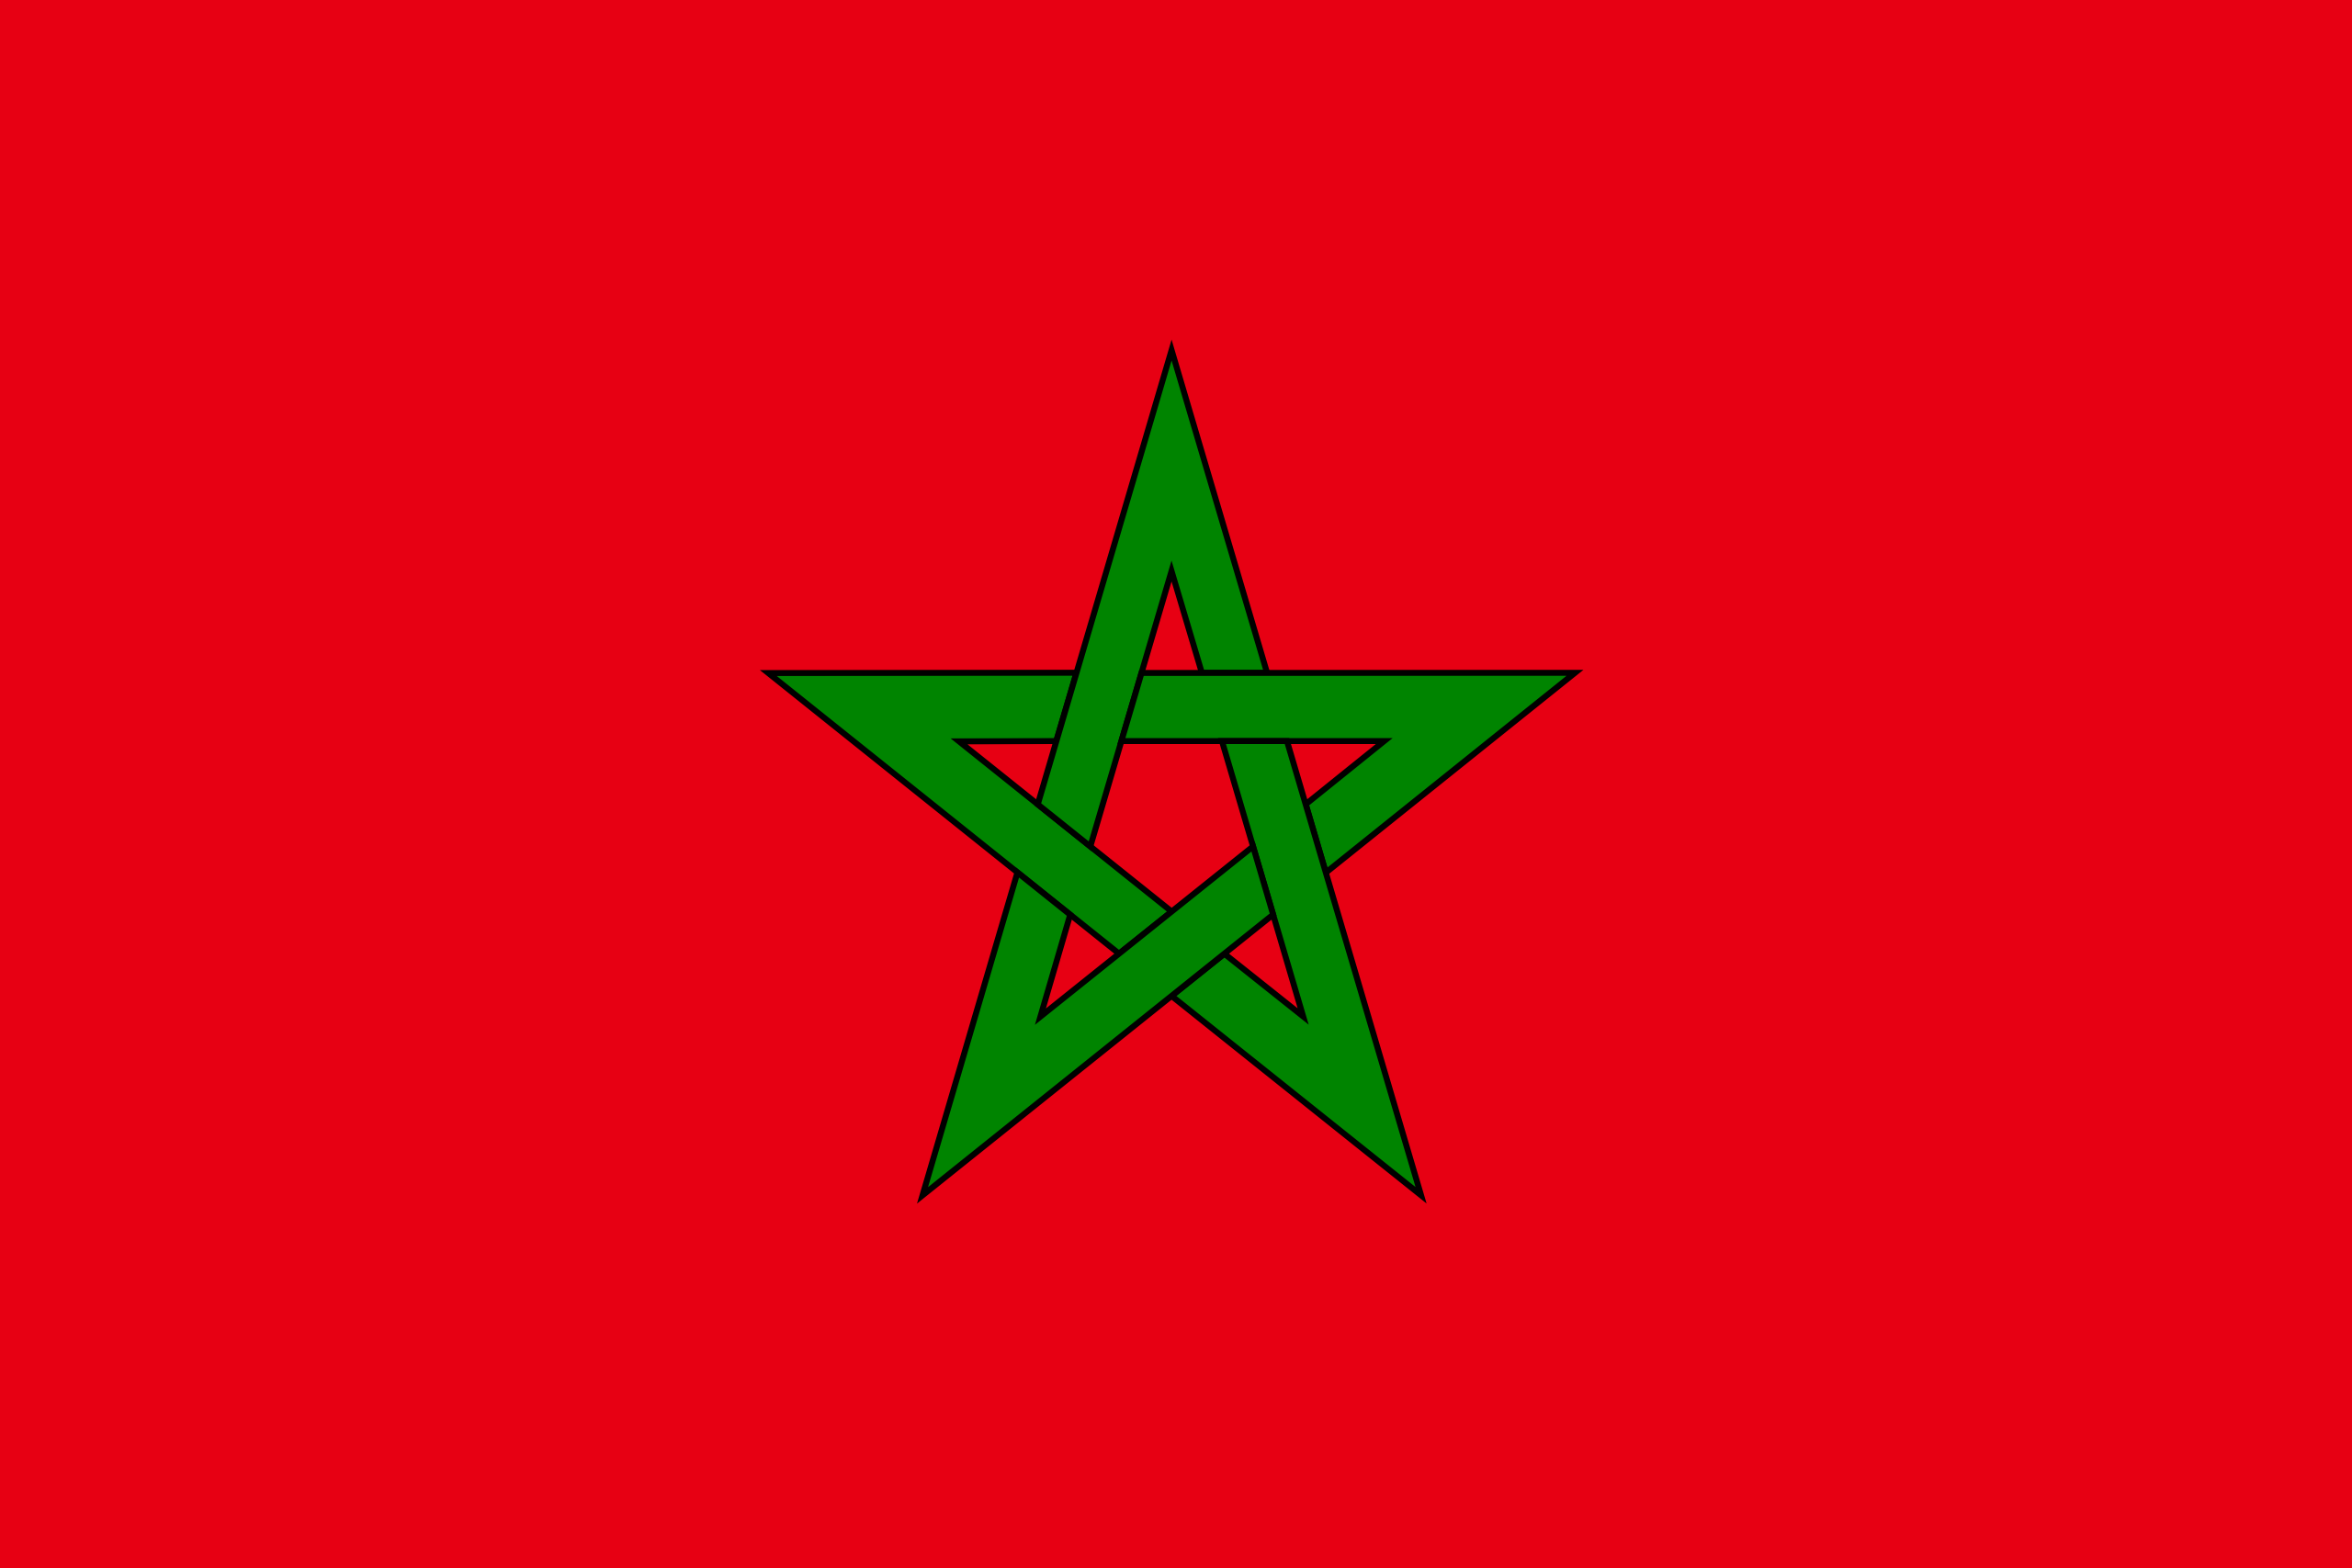 marruecos, страна, Эмблема, логотип, символ - Обои HD - Профессор falken.com